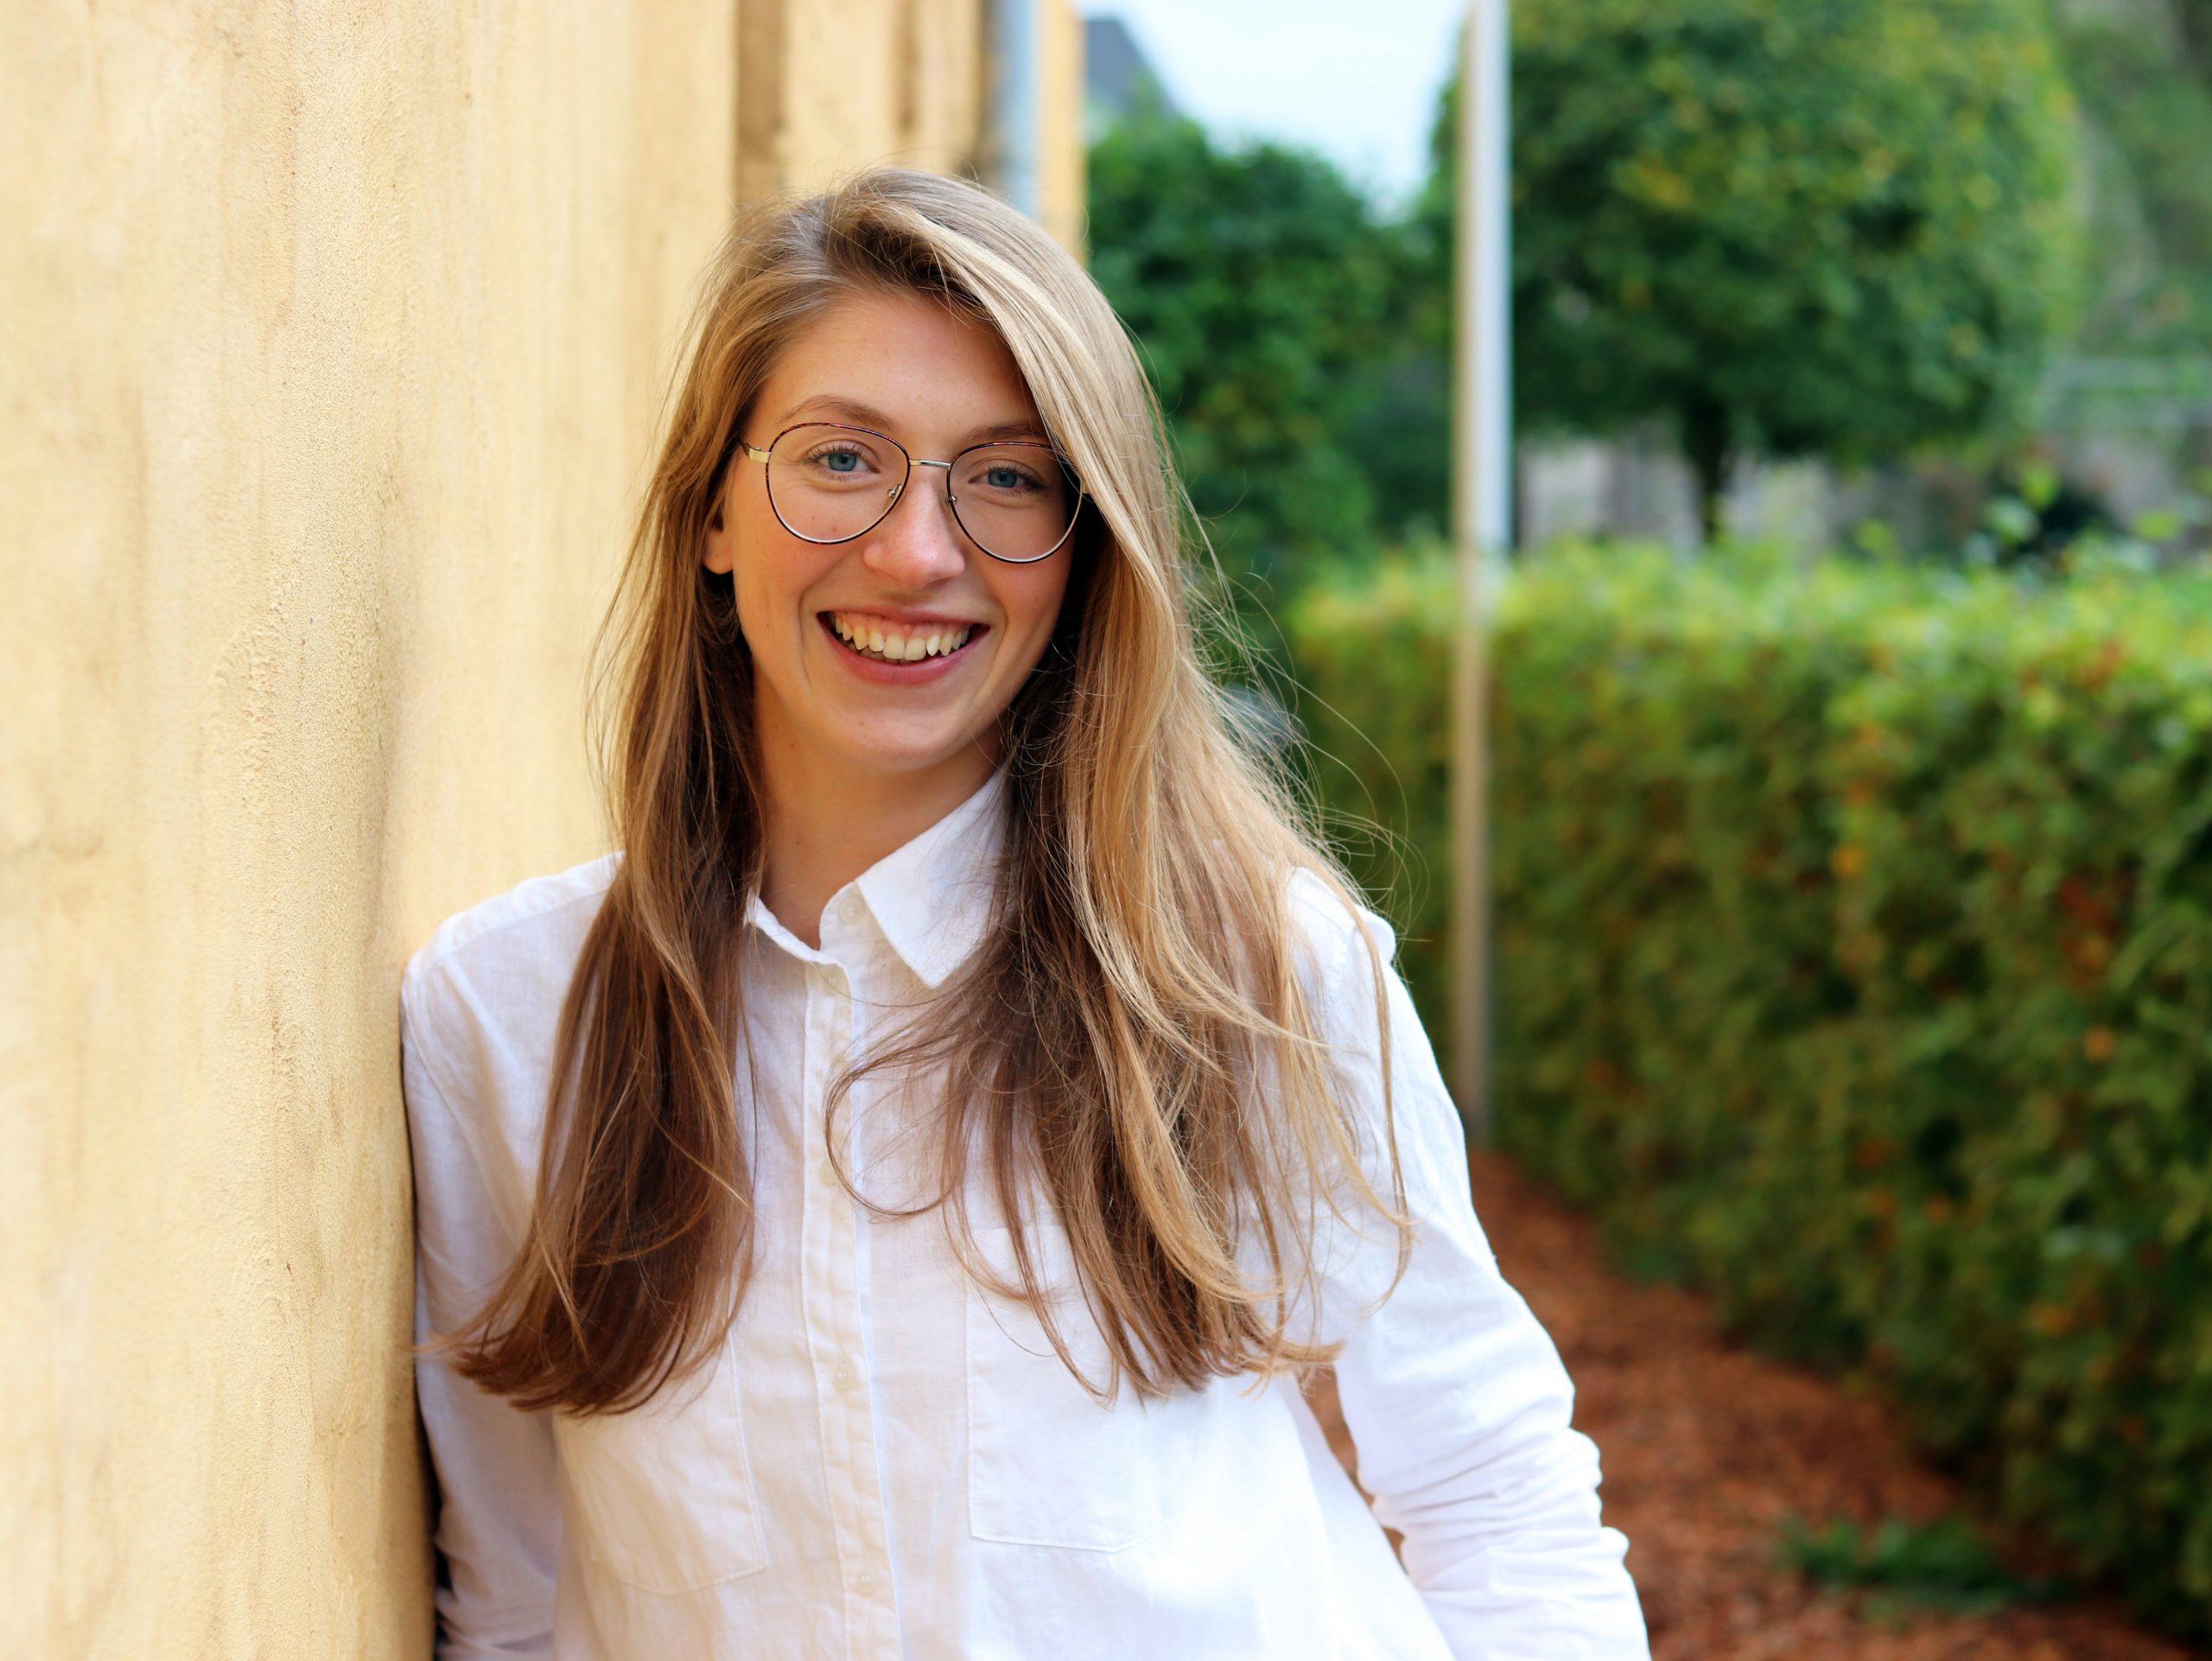 Josefine Bellmann